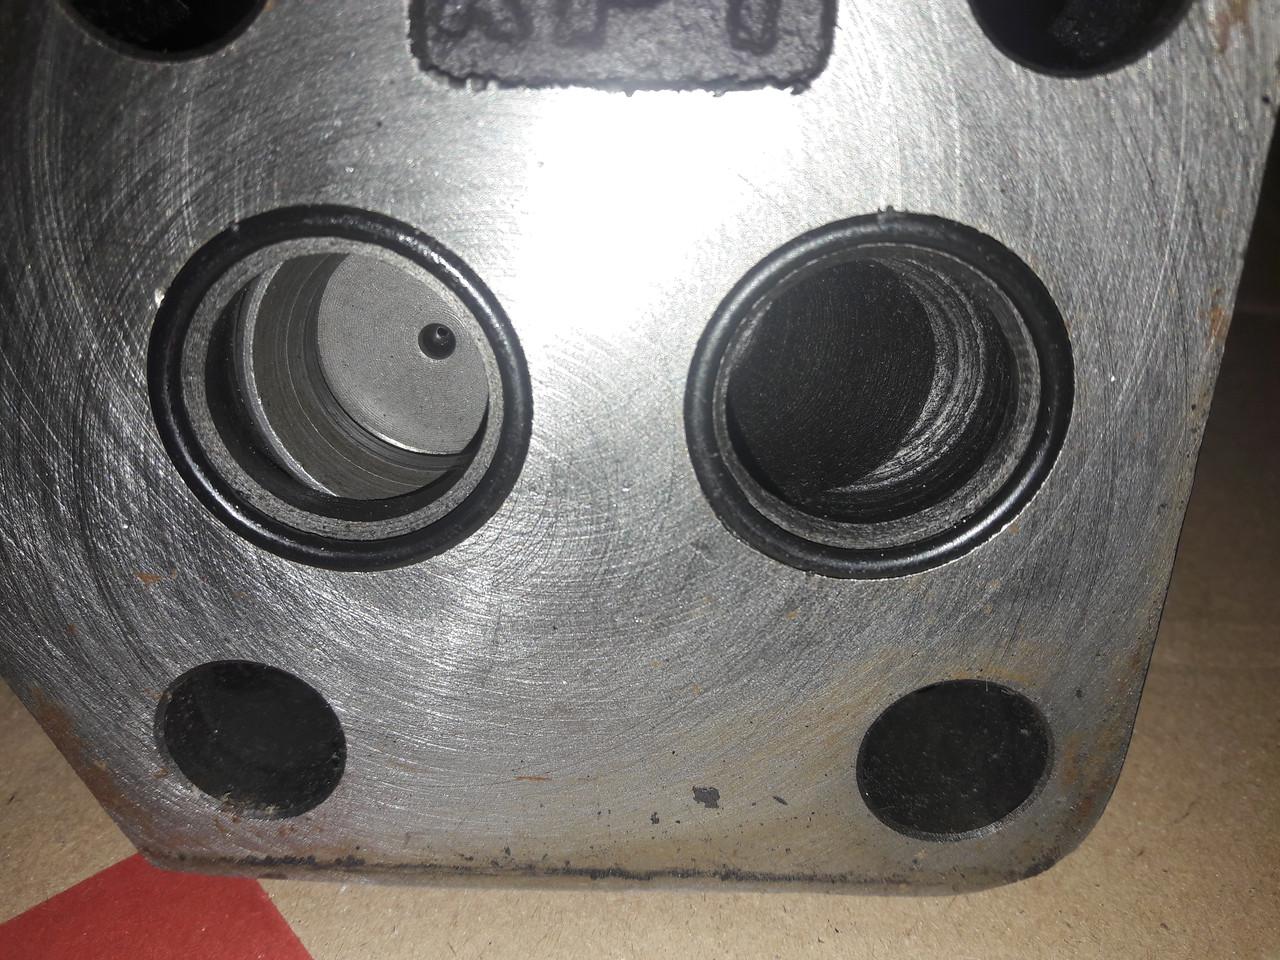 Клапан М-КП32-10(20,32)-2-11, МКП 32-10-2-11, МКП-32 20 2 11, МКП 32-32-2-11